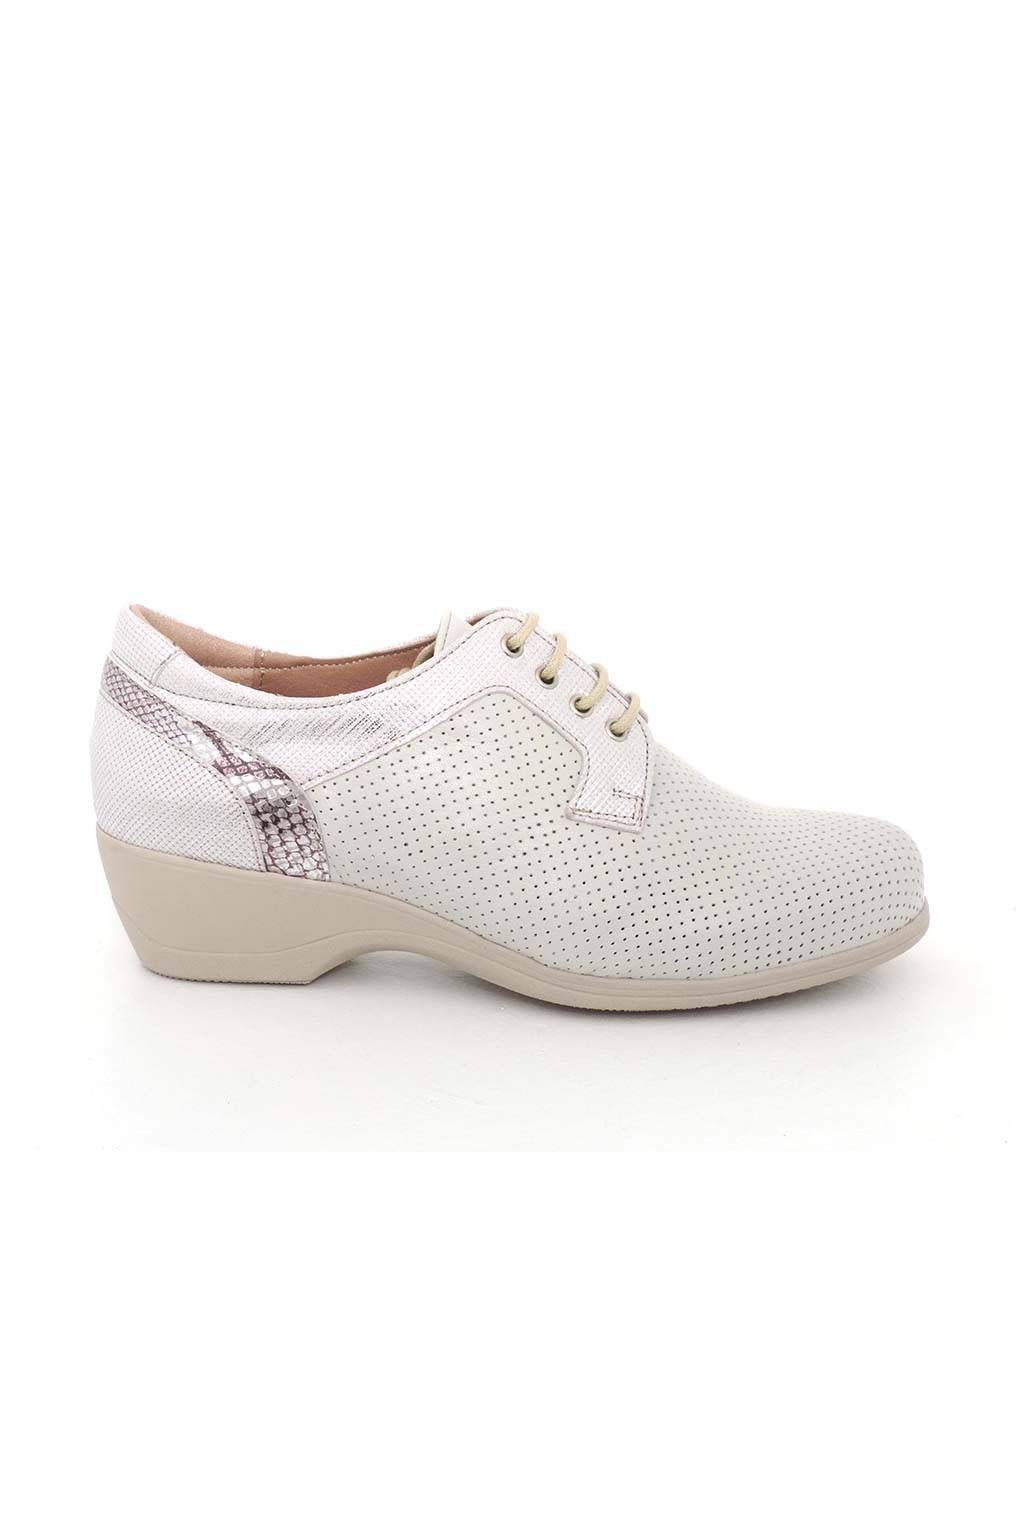 6239448bfdd Shoes Tolino 15015 - medinapiel.es